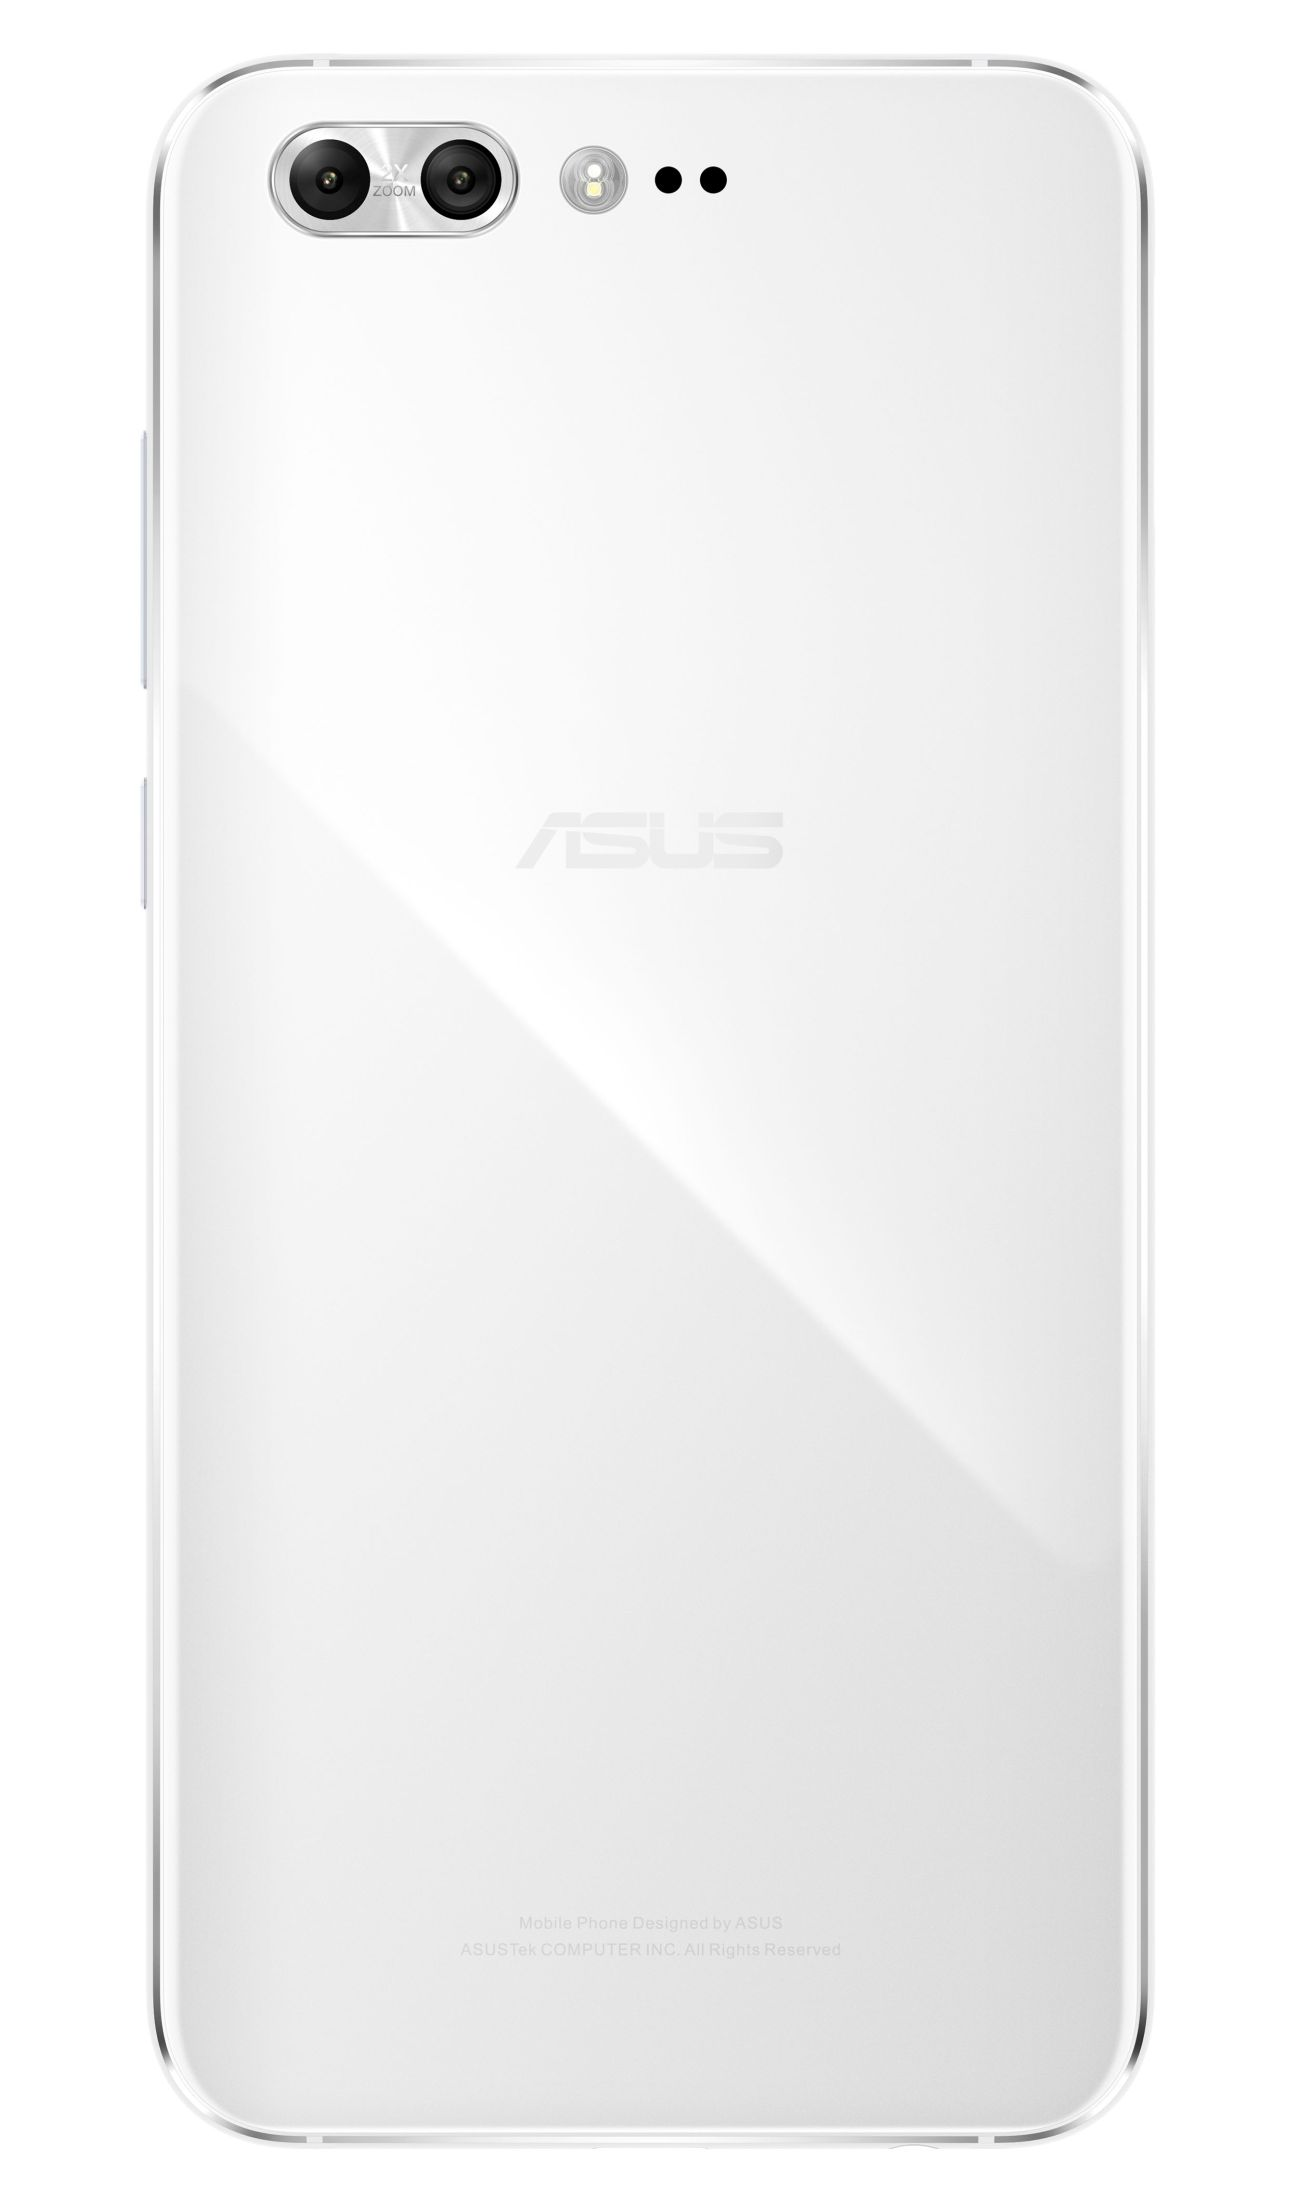 ZenFone 4 Pro_ZS551KL_Moonlight White (10) copy